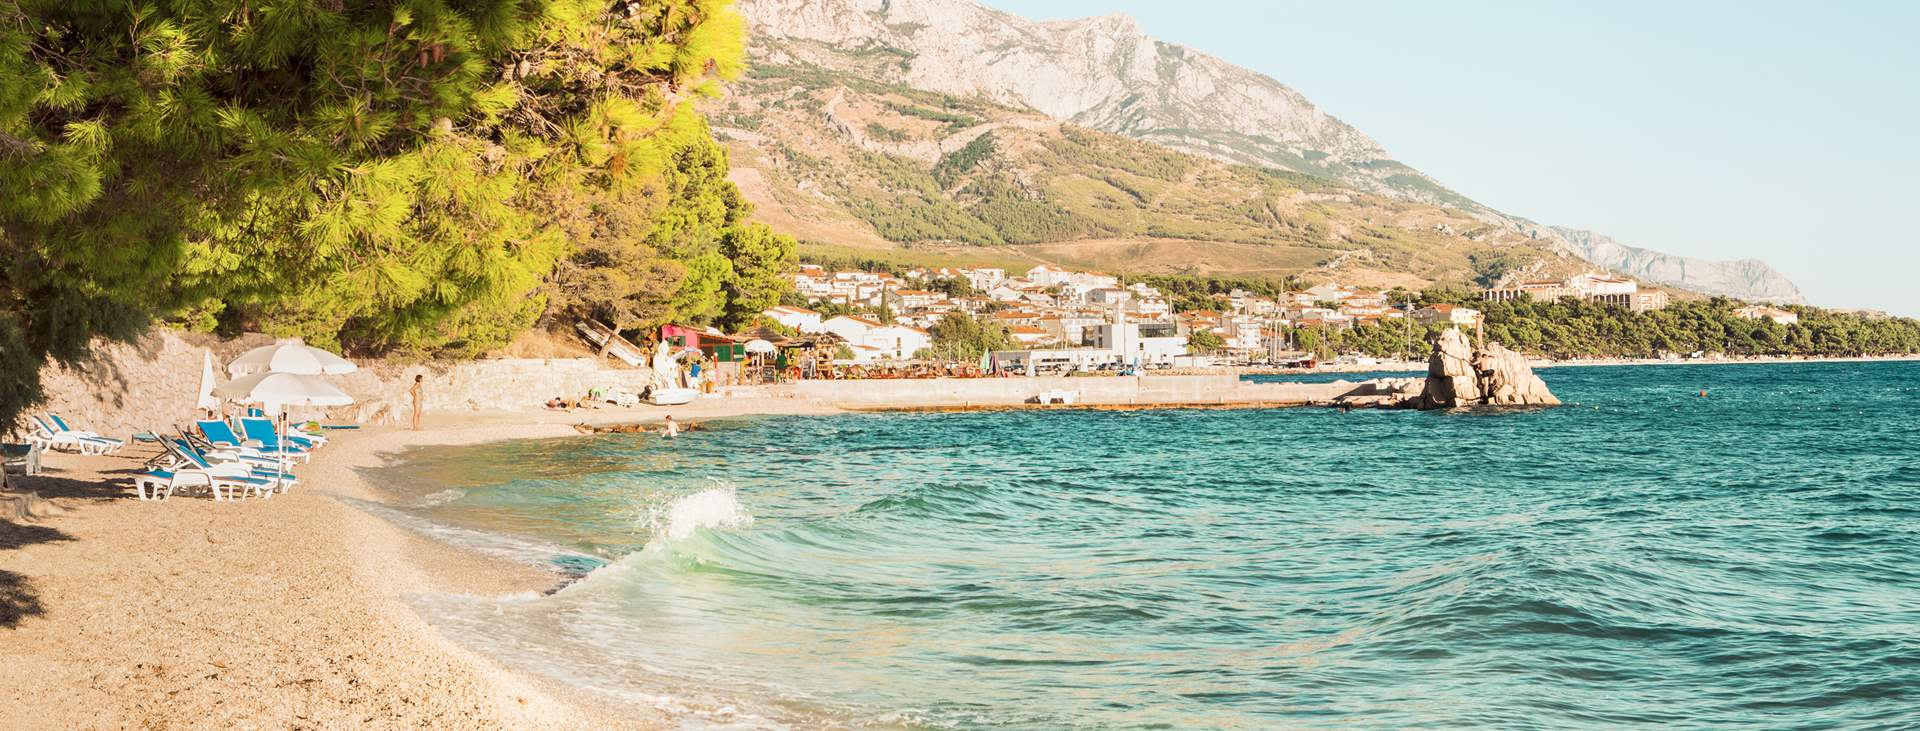 Matkat Brelaan, Makarska Rivieralle Kroatiaan